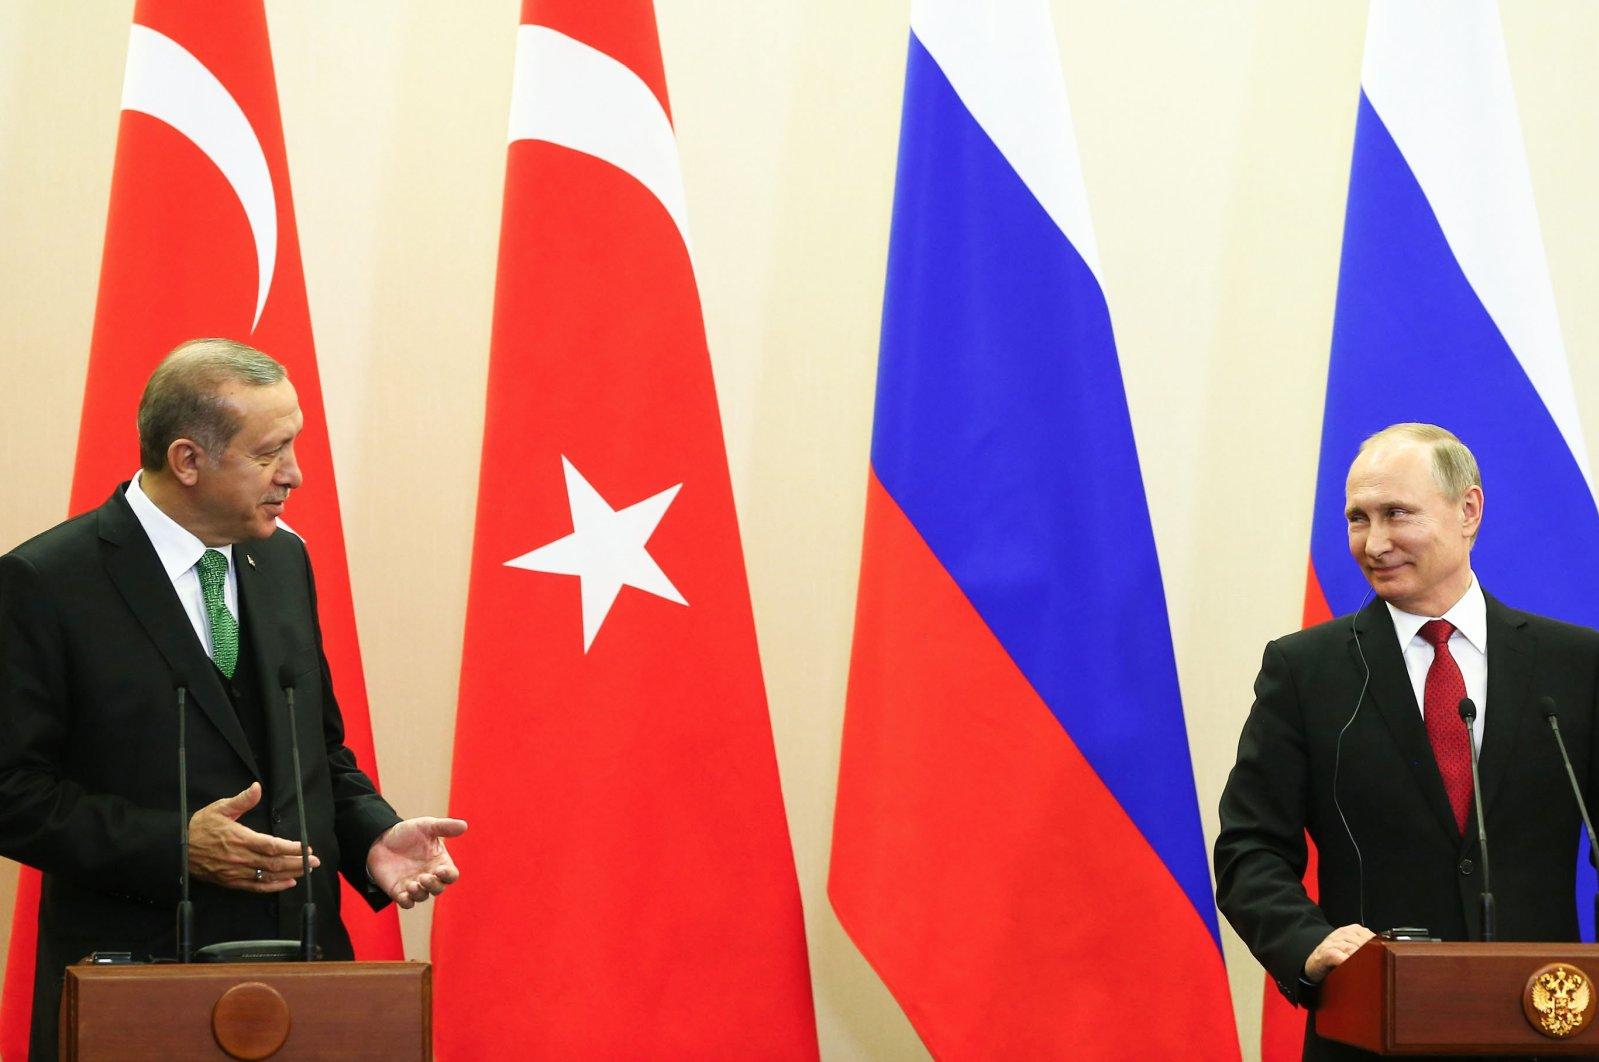 Turkish citizens prefer Russia to US as strategic partner: Survey